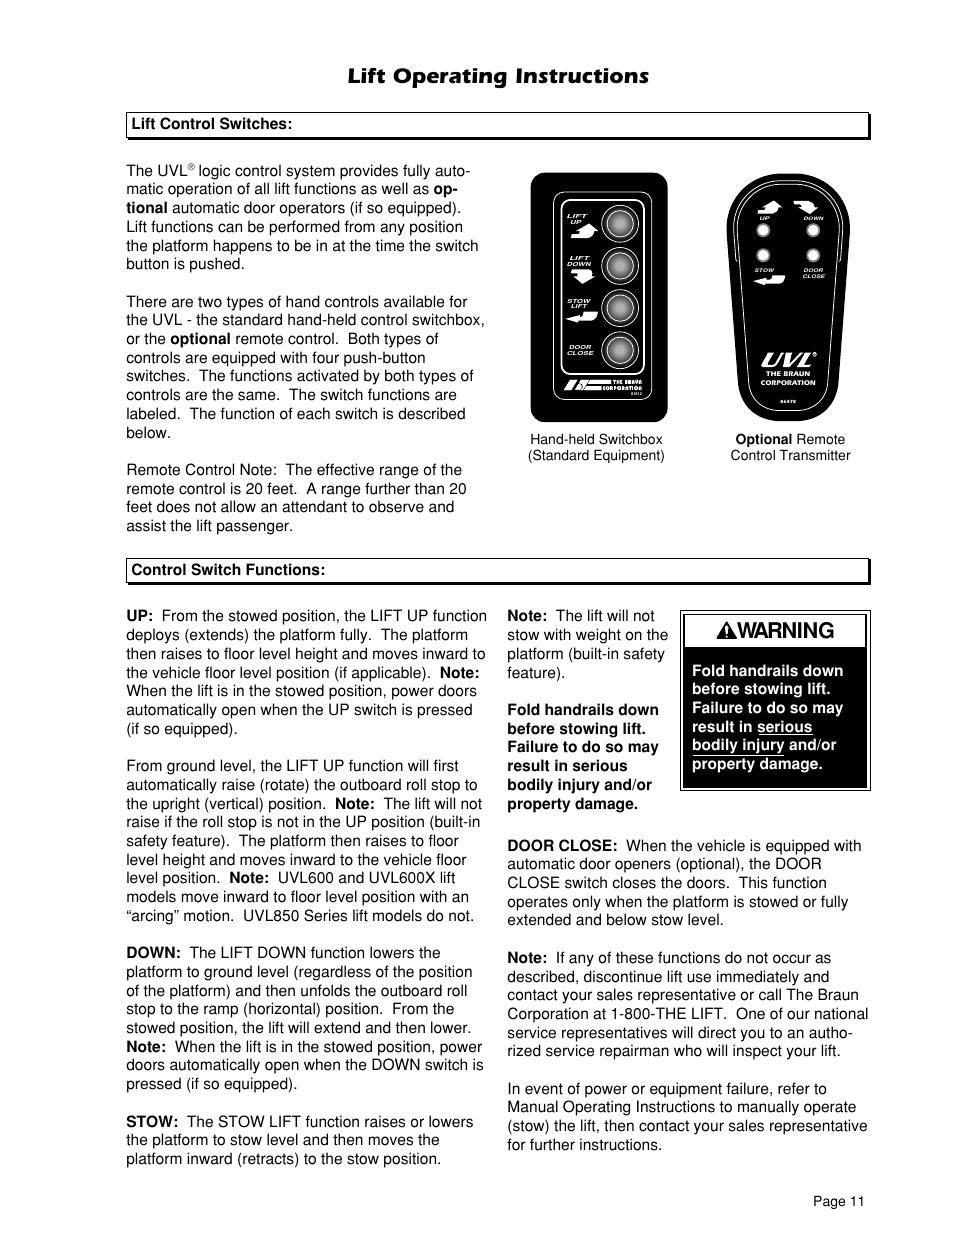 lift operating instructions warning lift control switches the uvl rh manualsdir com braun lift manual l9171b braun lift manual for l917